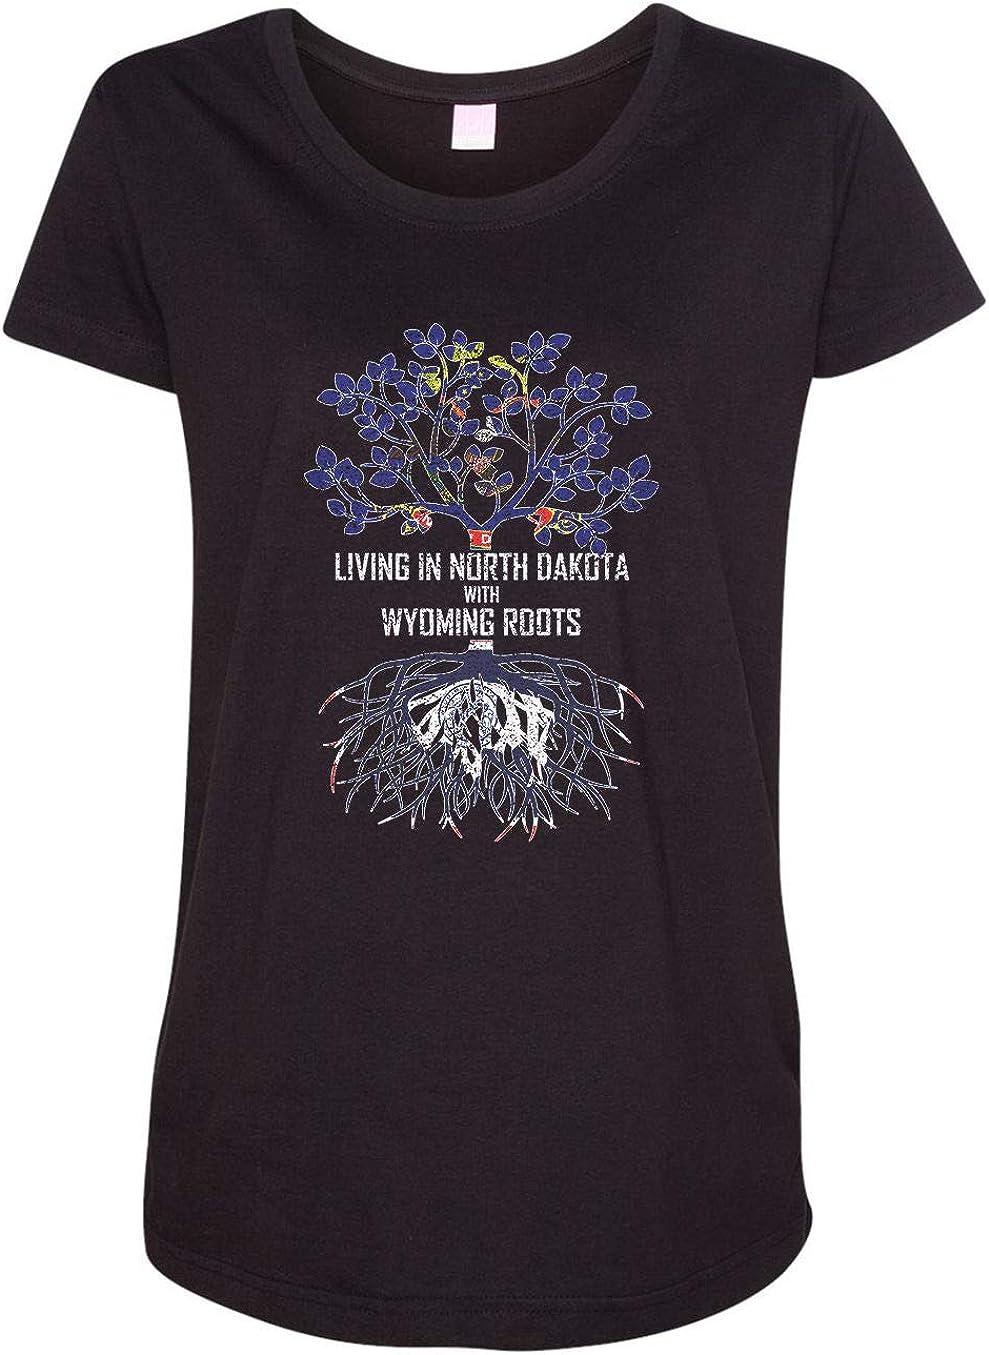 HARD EDGE DESIGN Women's Living in North Dakota with Wyoming Roots T-Shirt